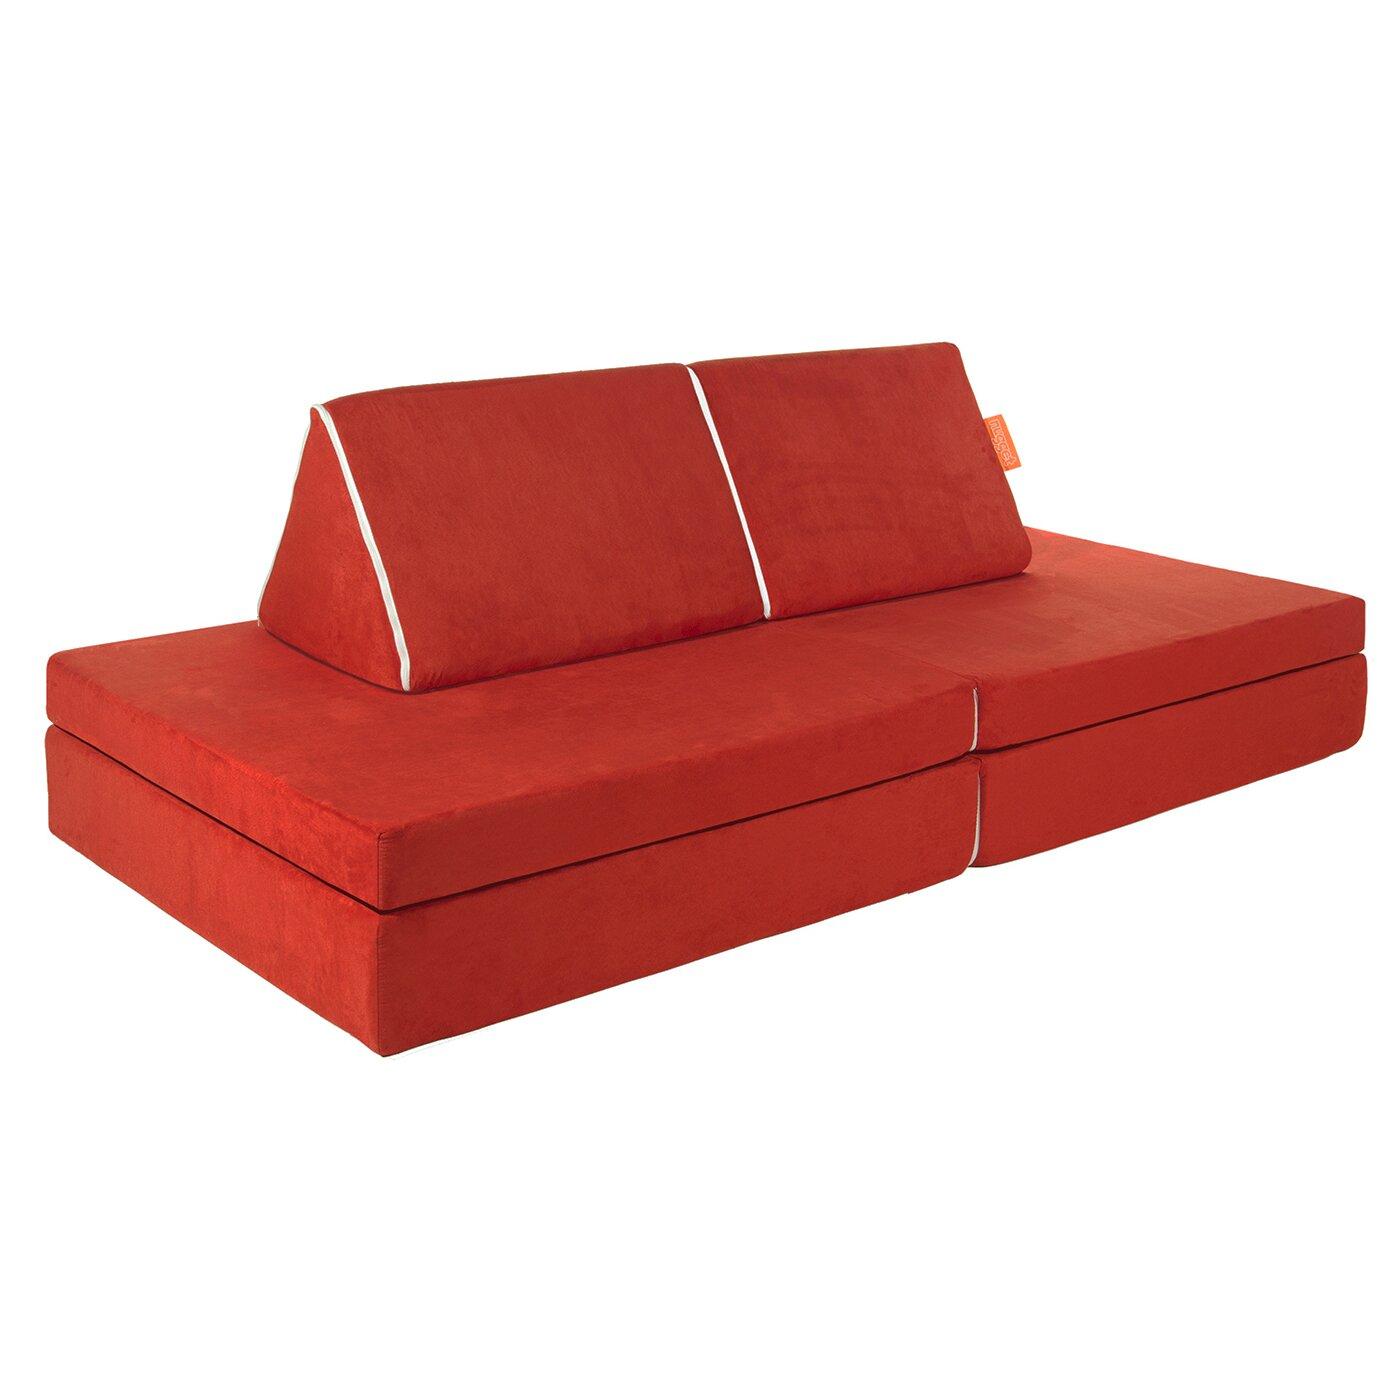 nugget 4 piece kids sofa set reviews wayfair kids sleeper so